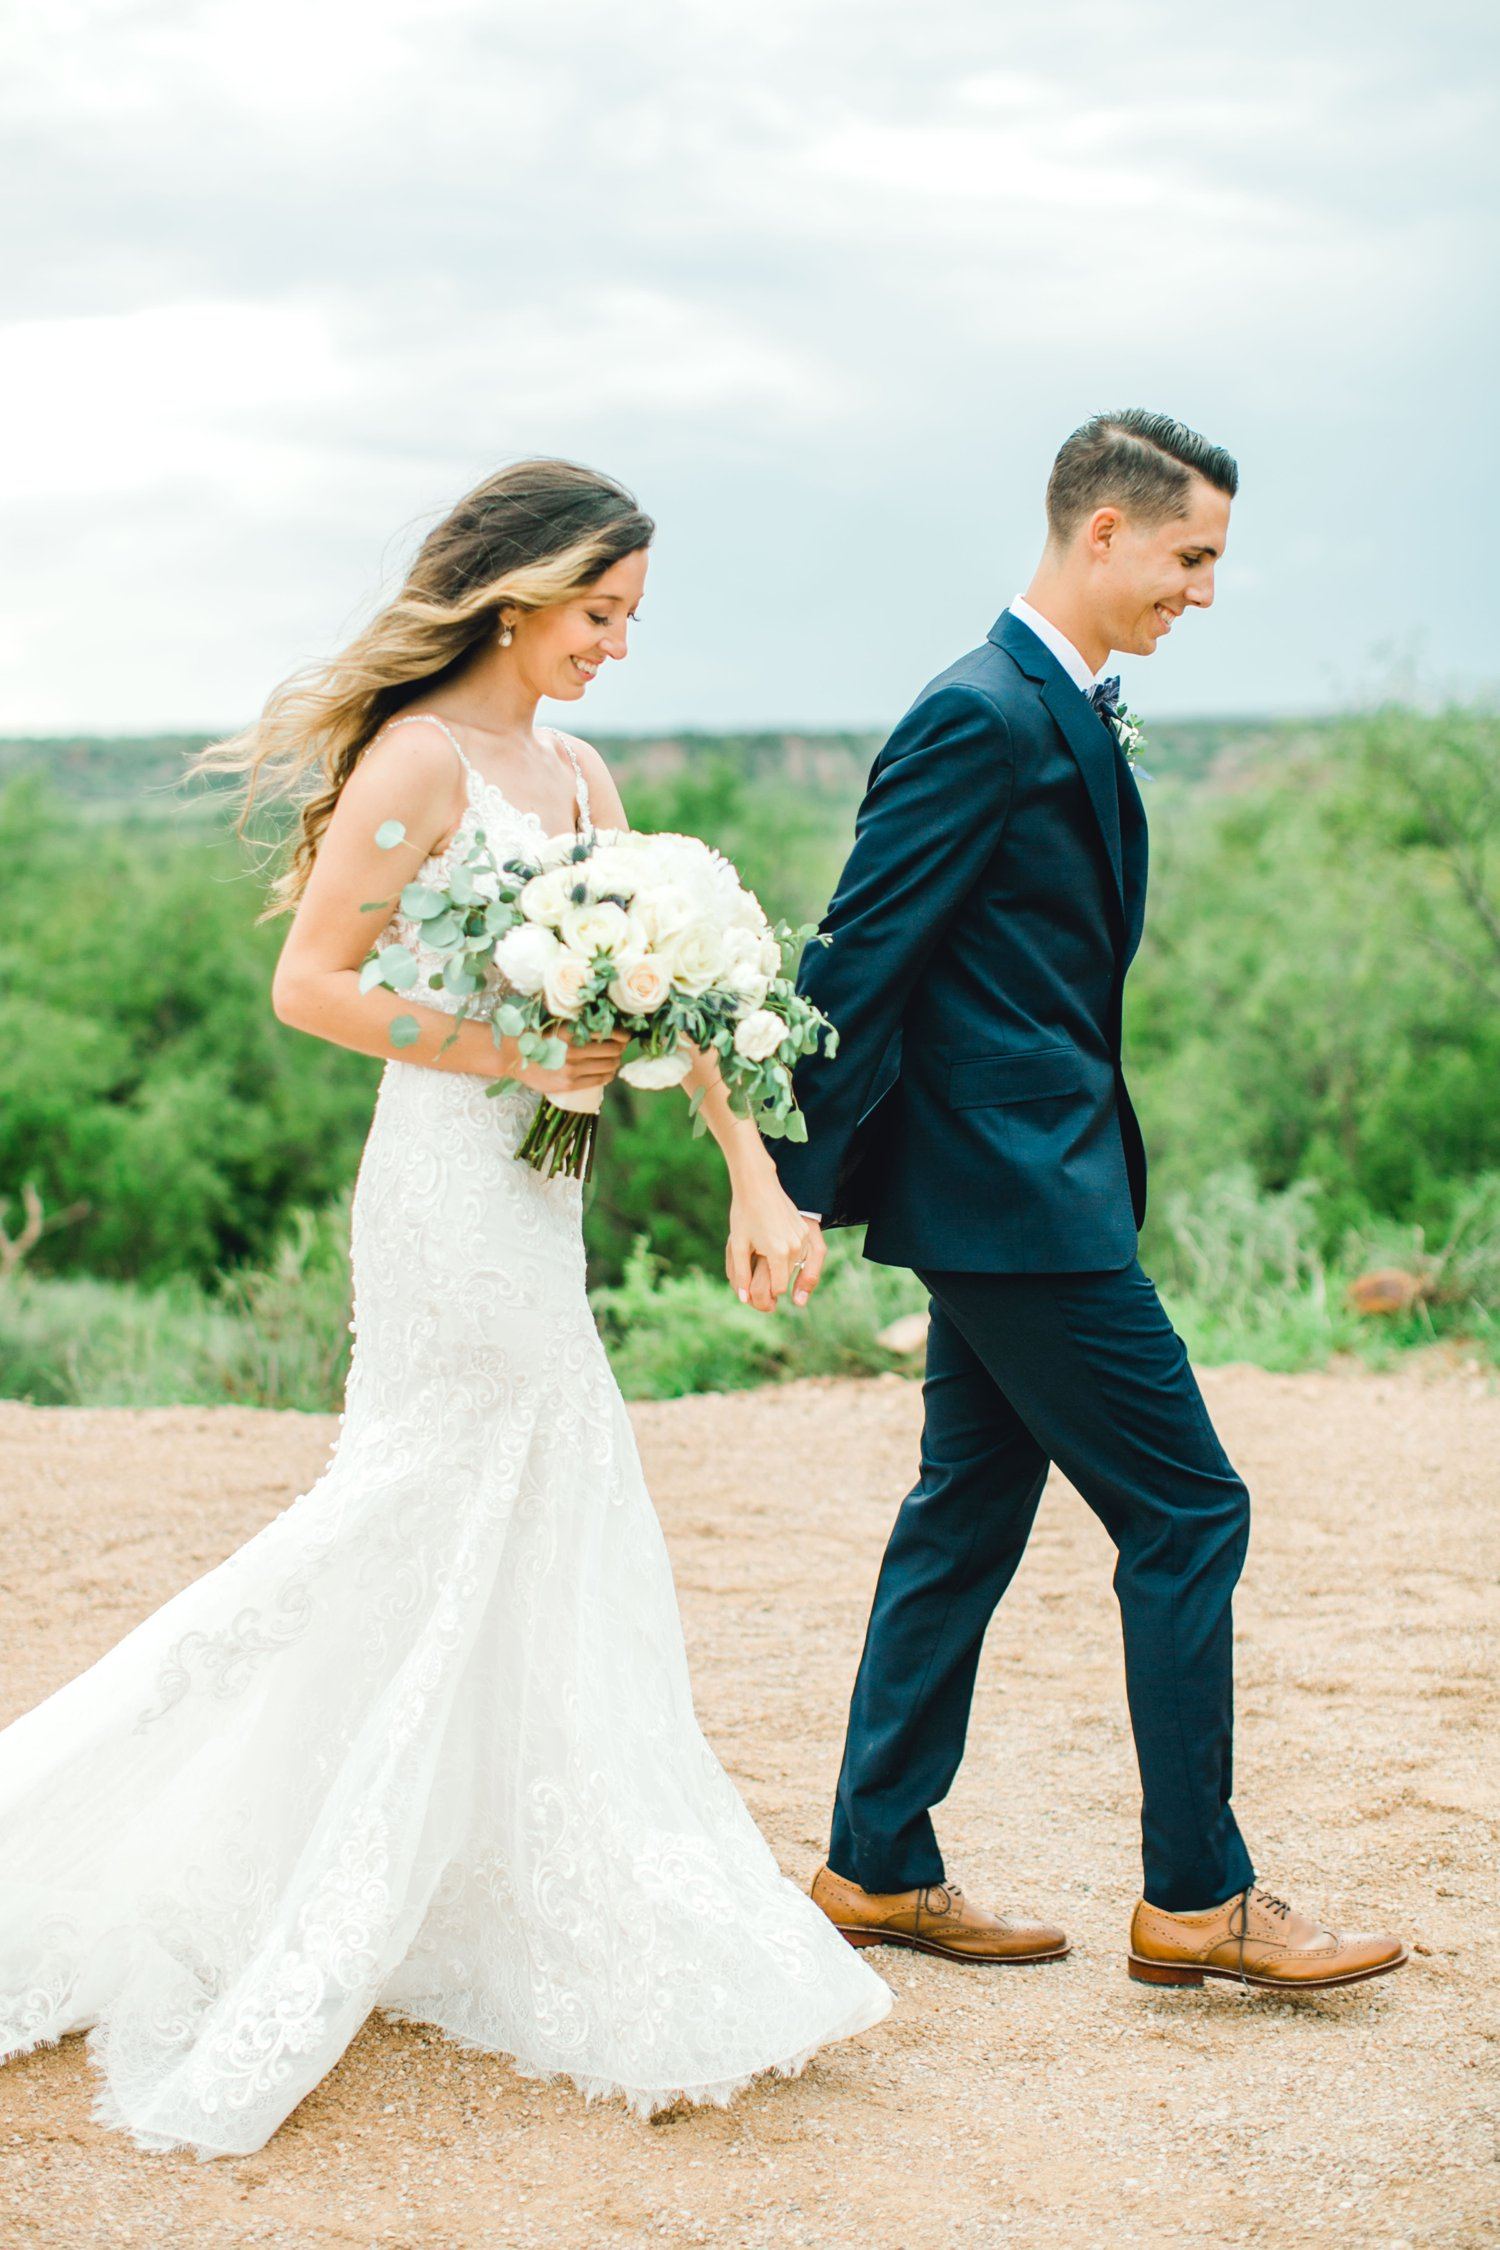 Ashley_John_English_Elegant_Texas_Wedding_Outdoors_Ranch_Caprock_Winery_ALLEEJ_0086.jpg